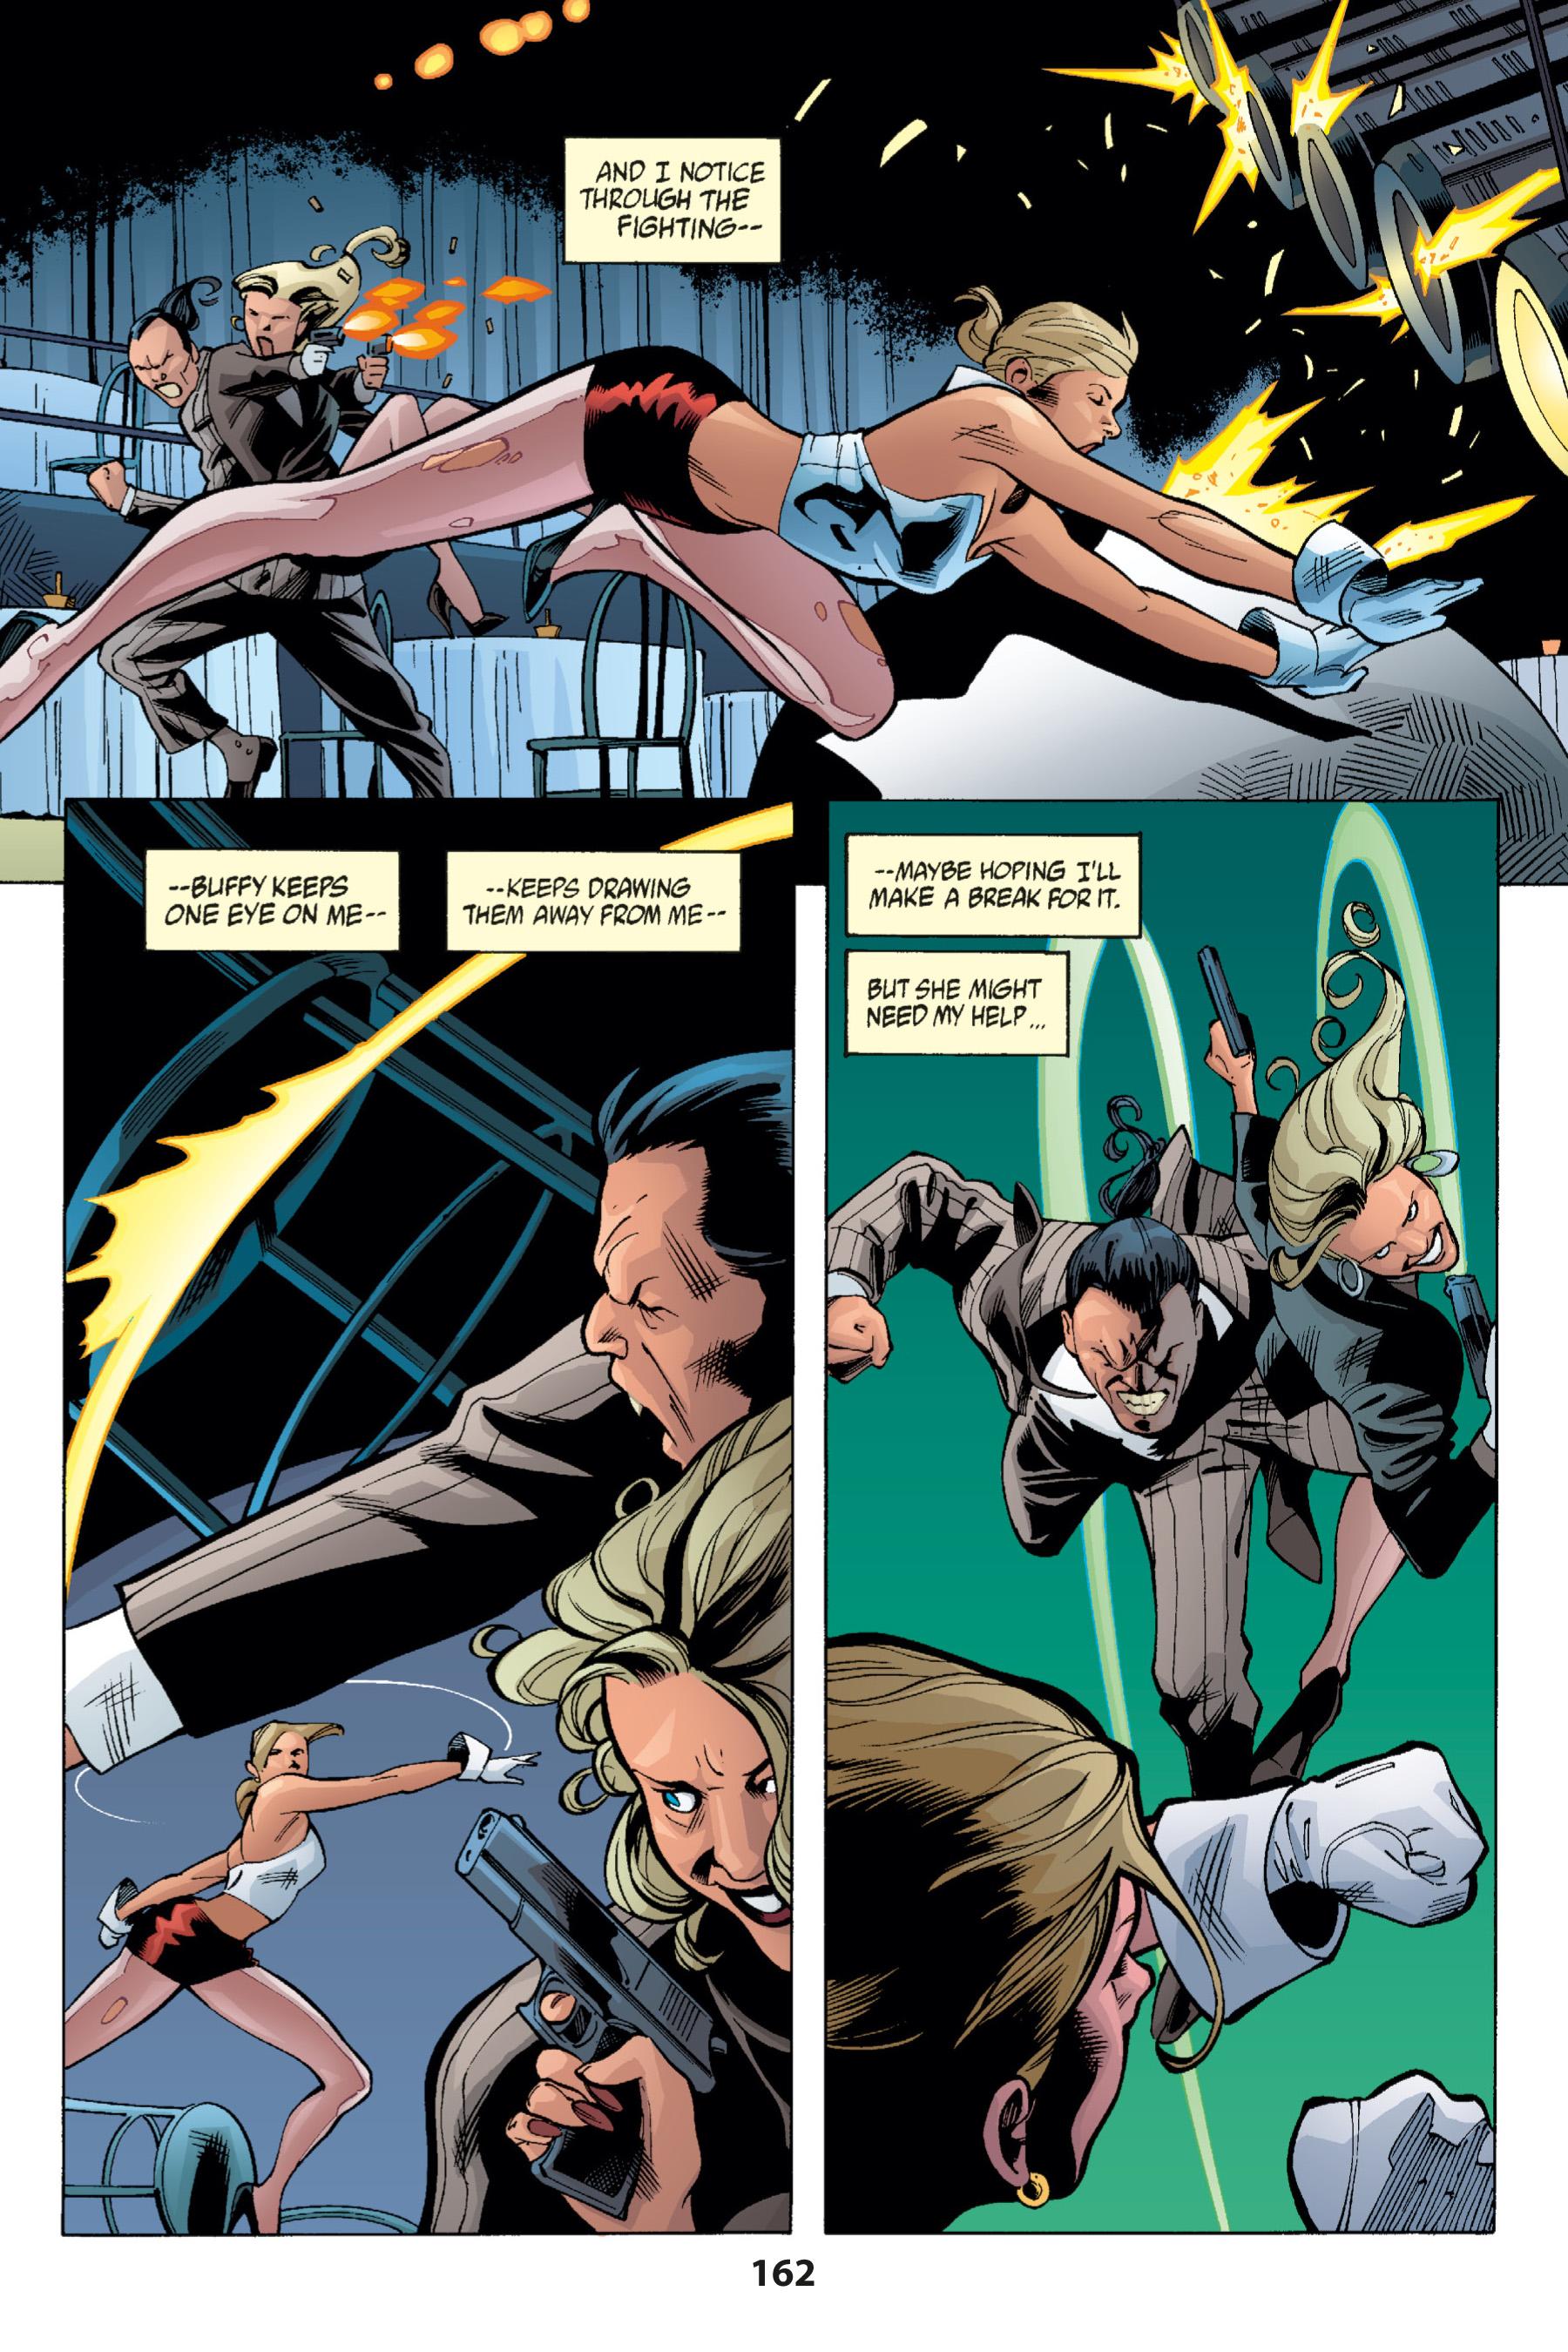 Read online Buffy the Vampire Slayer: Omnibus comic -  Issue # TPB 1 - 161